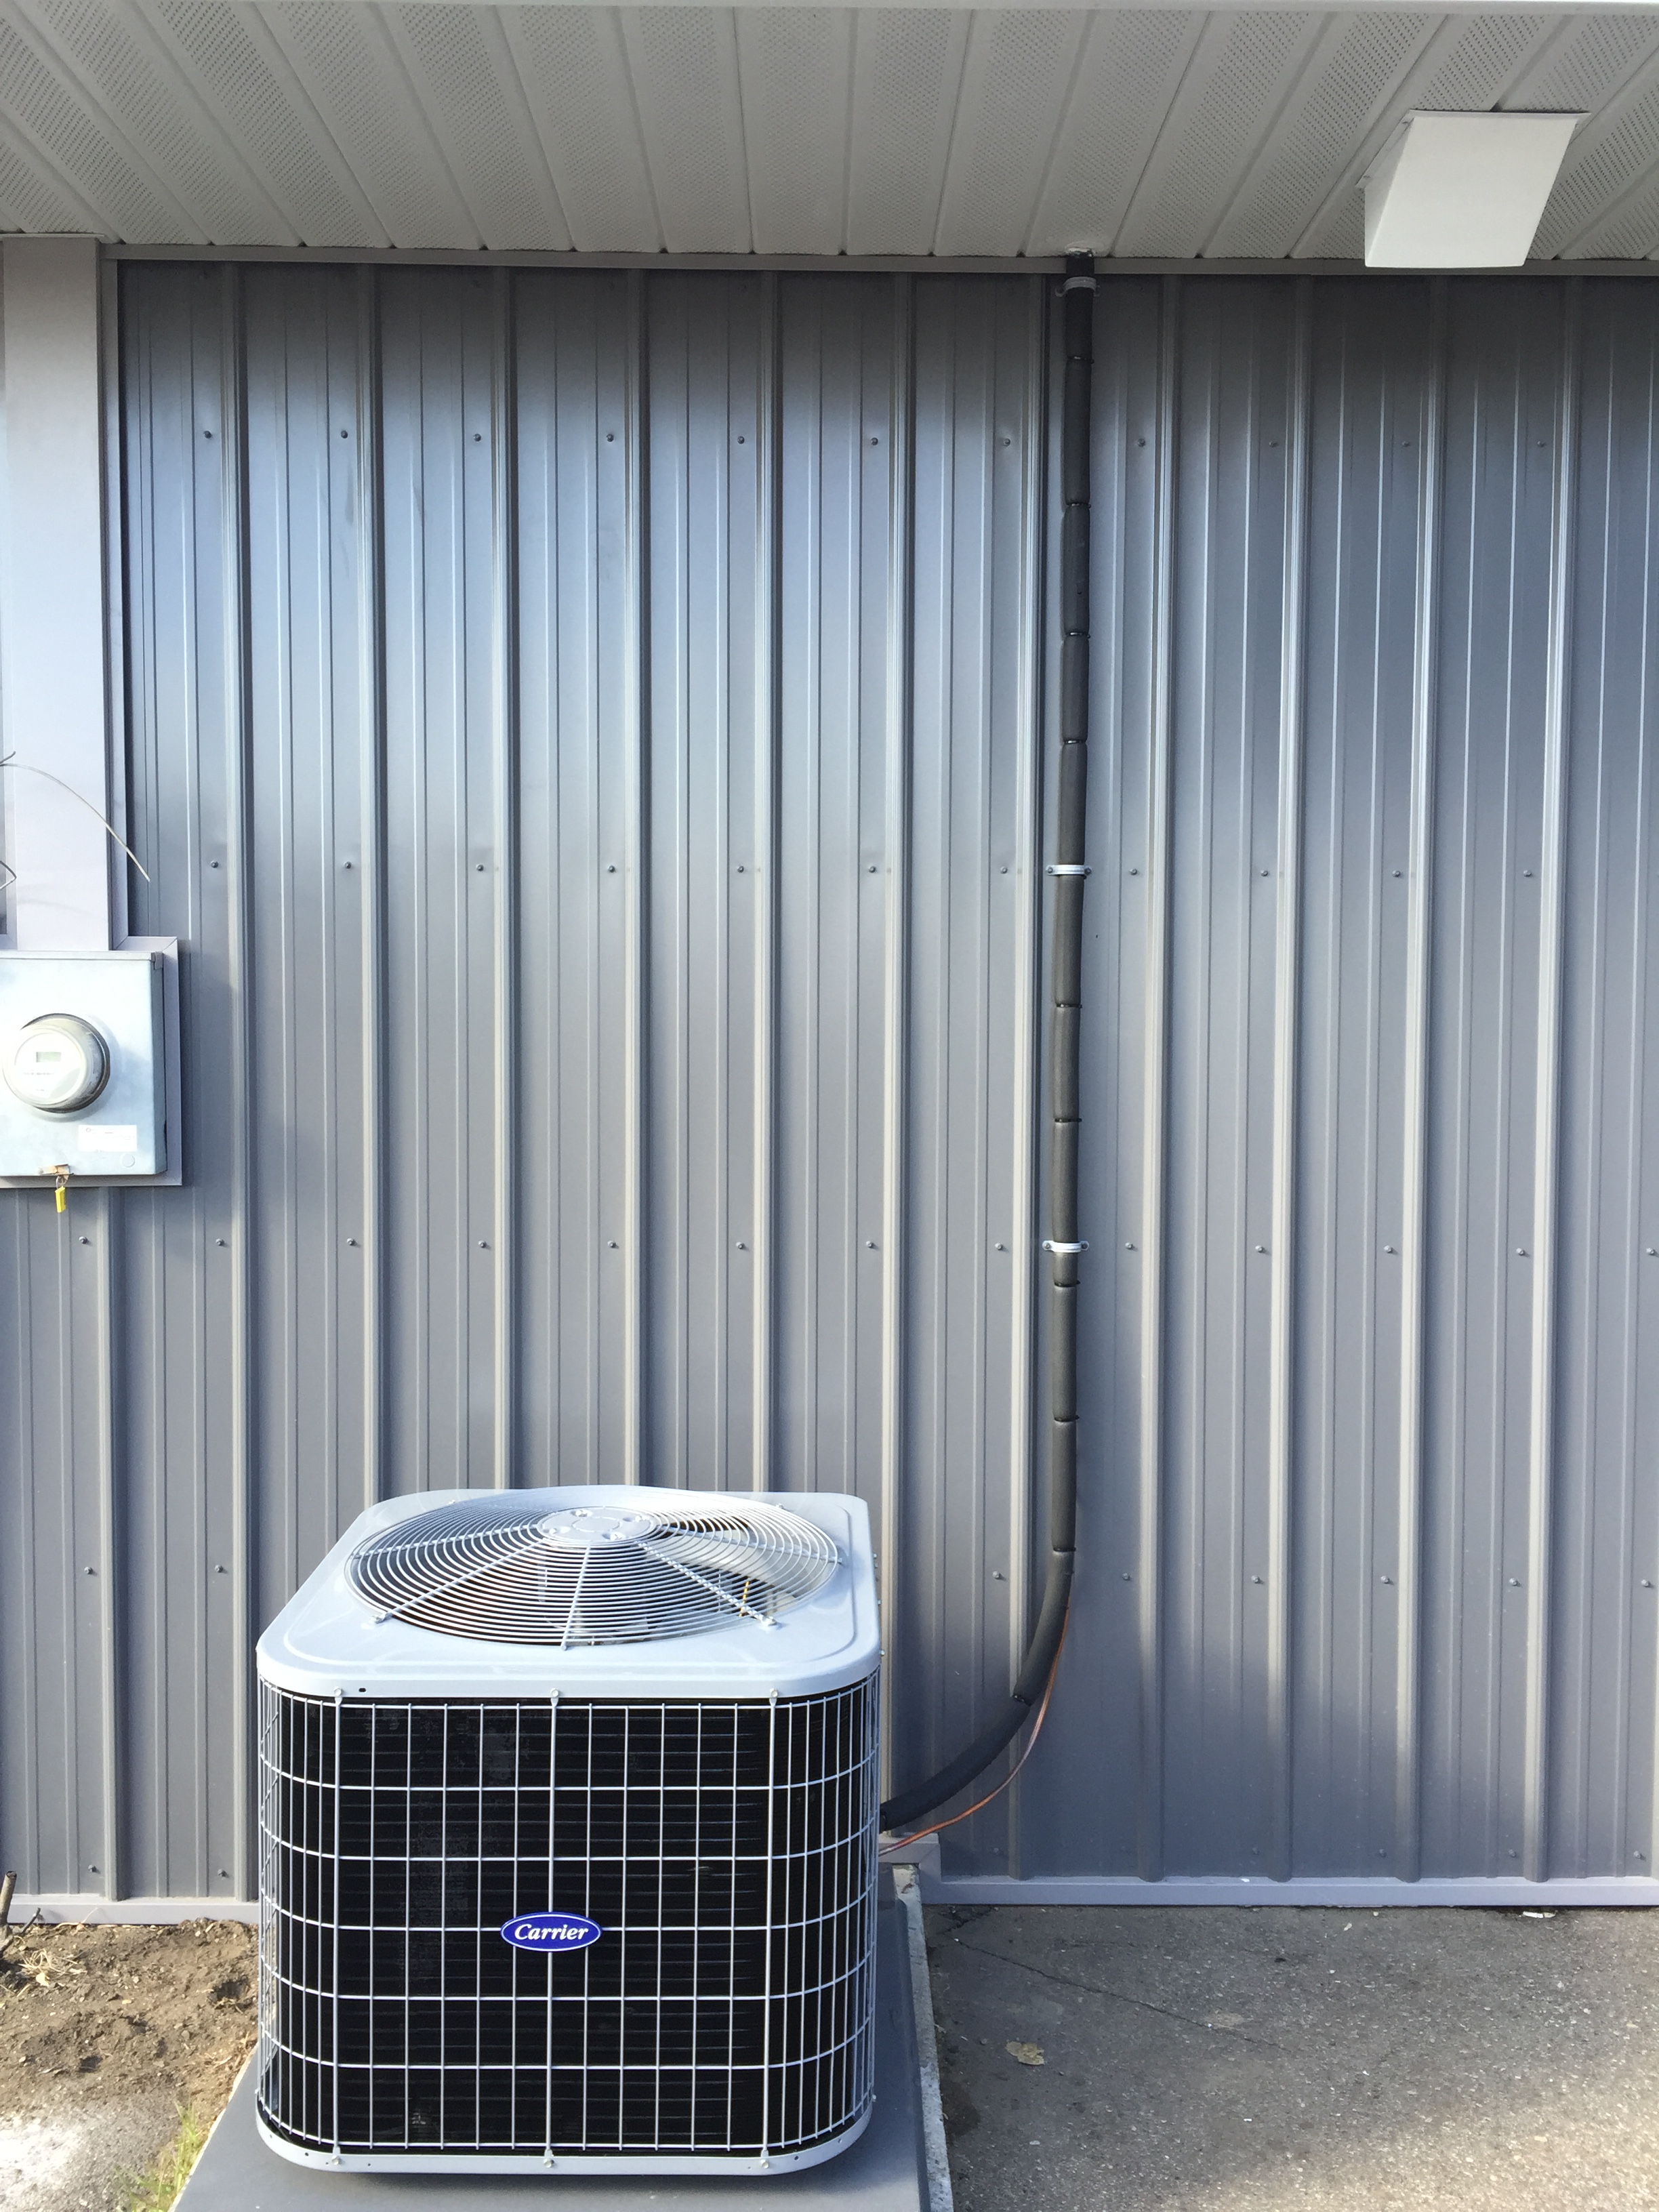 Carrier Split System Air Conditioner